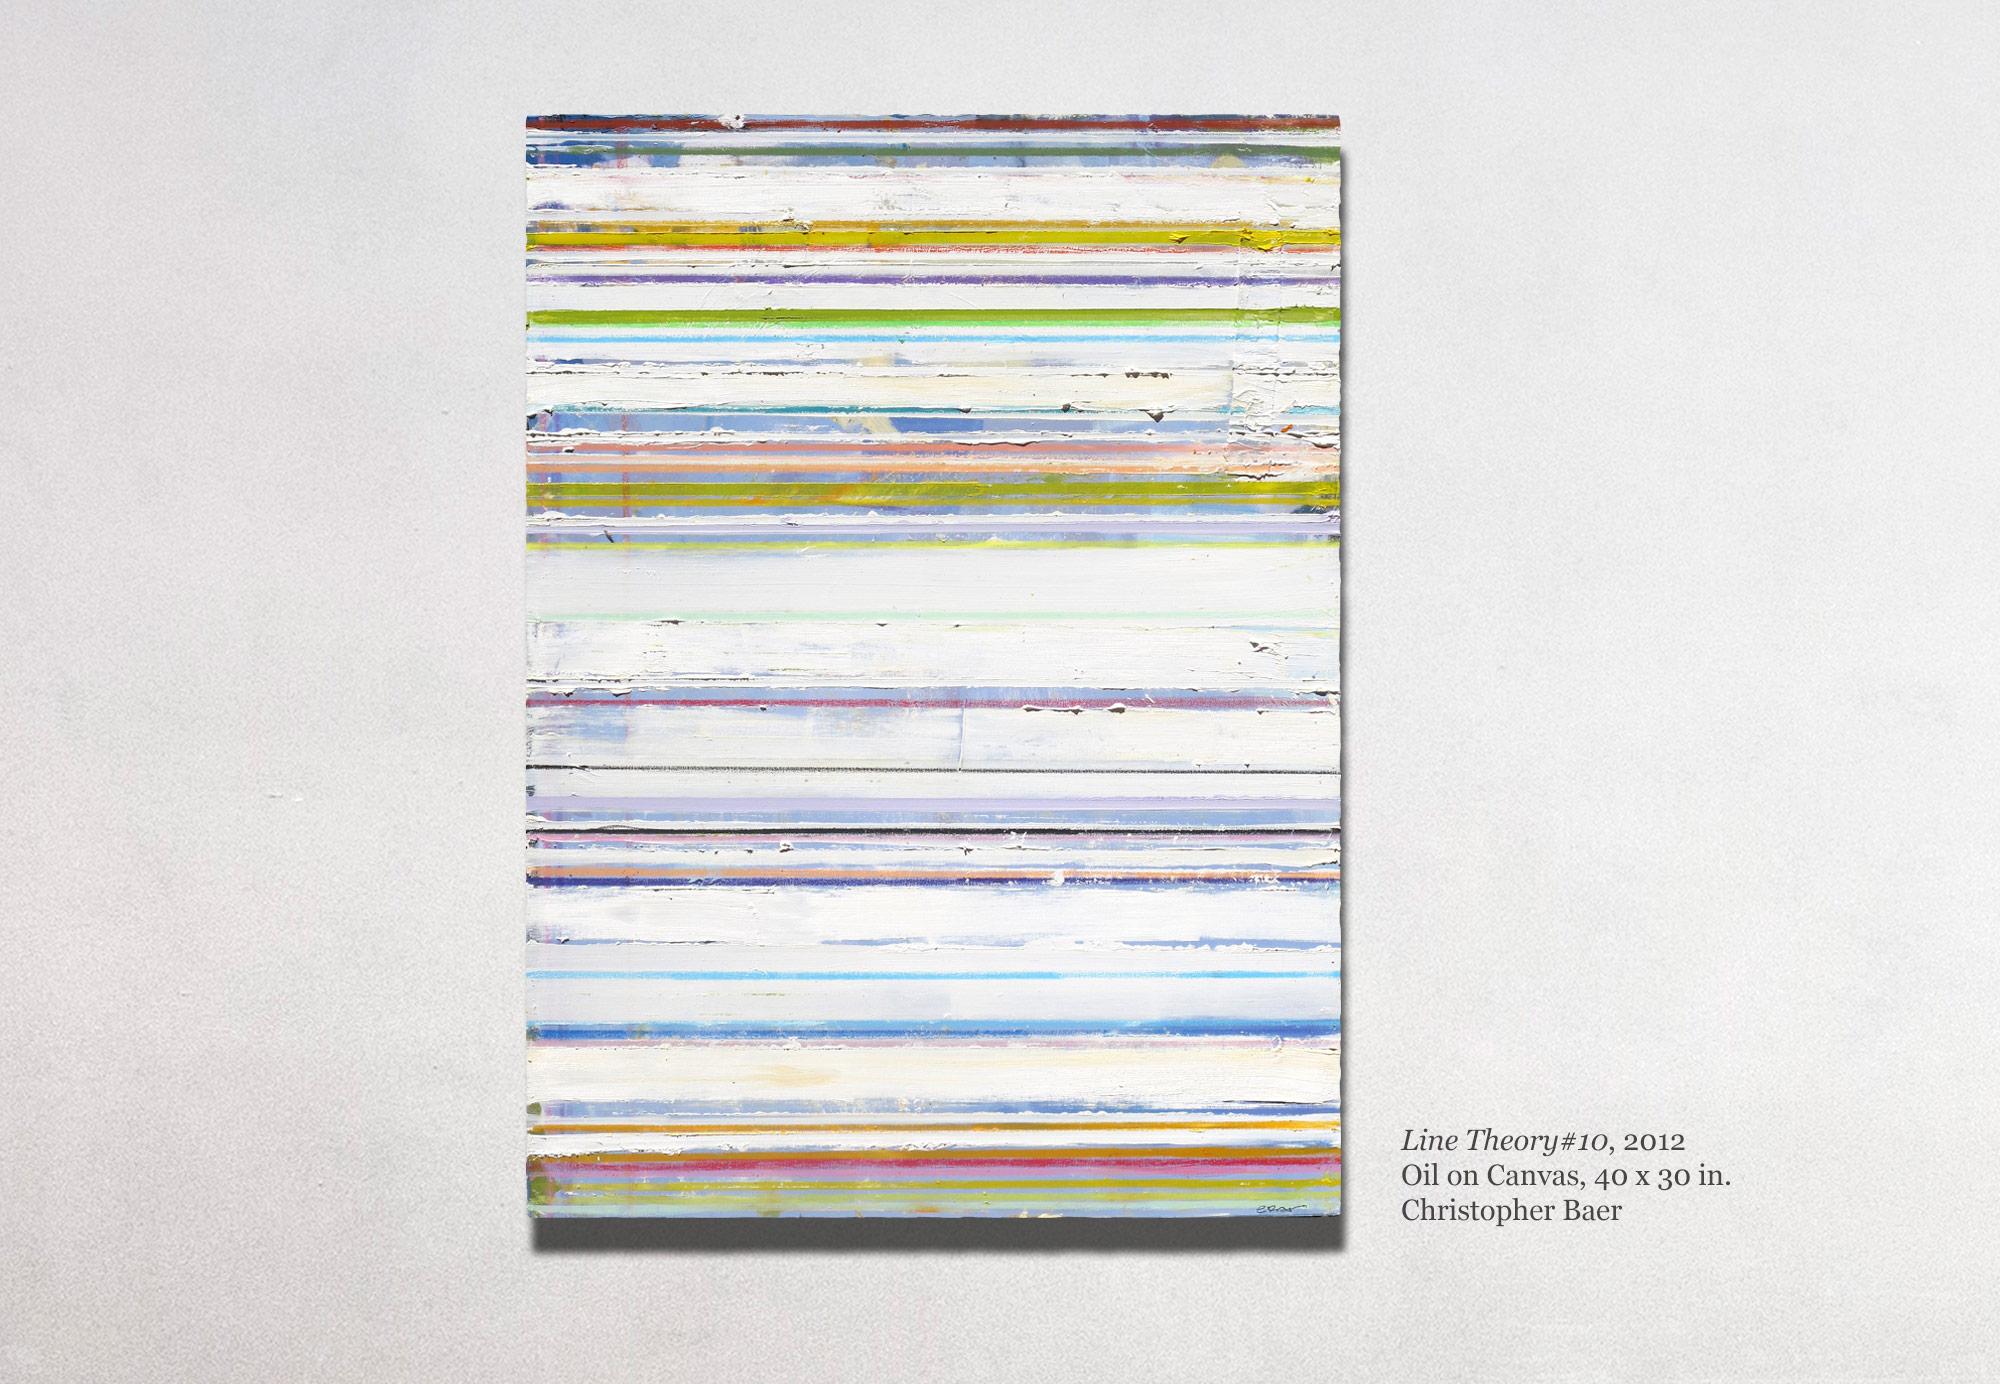 010.Line-Theory-40x30-2012-text.jpg